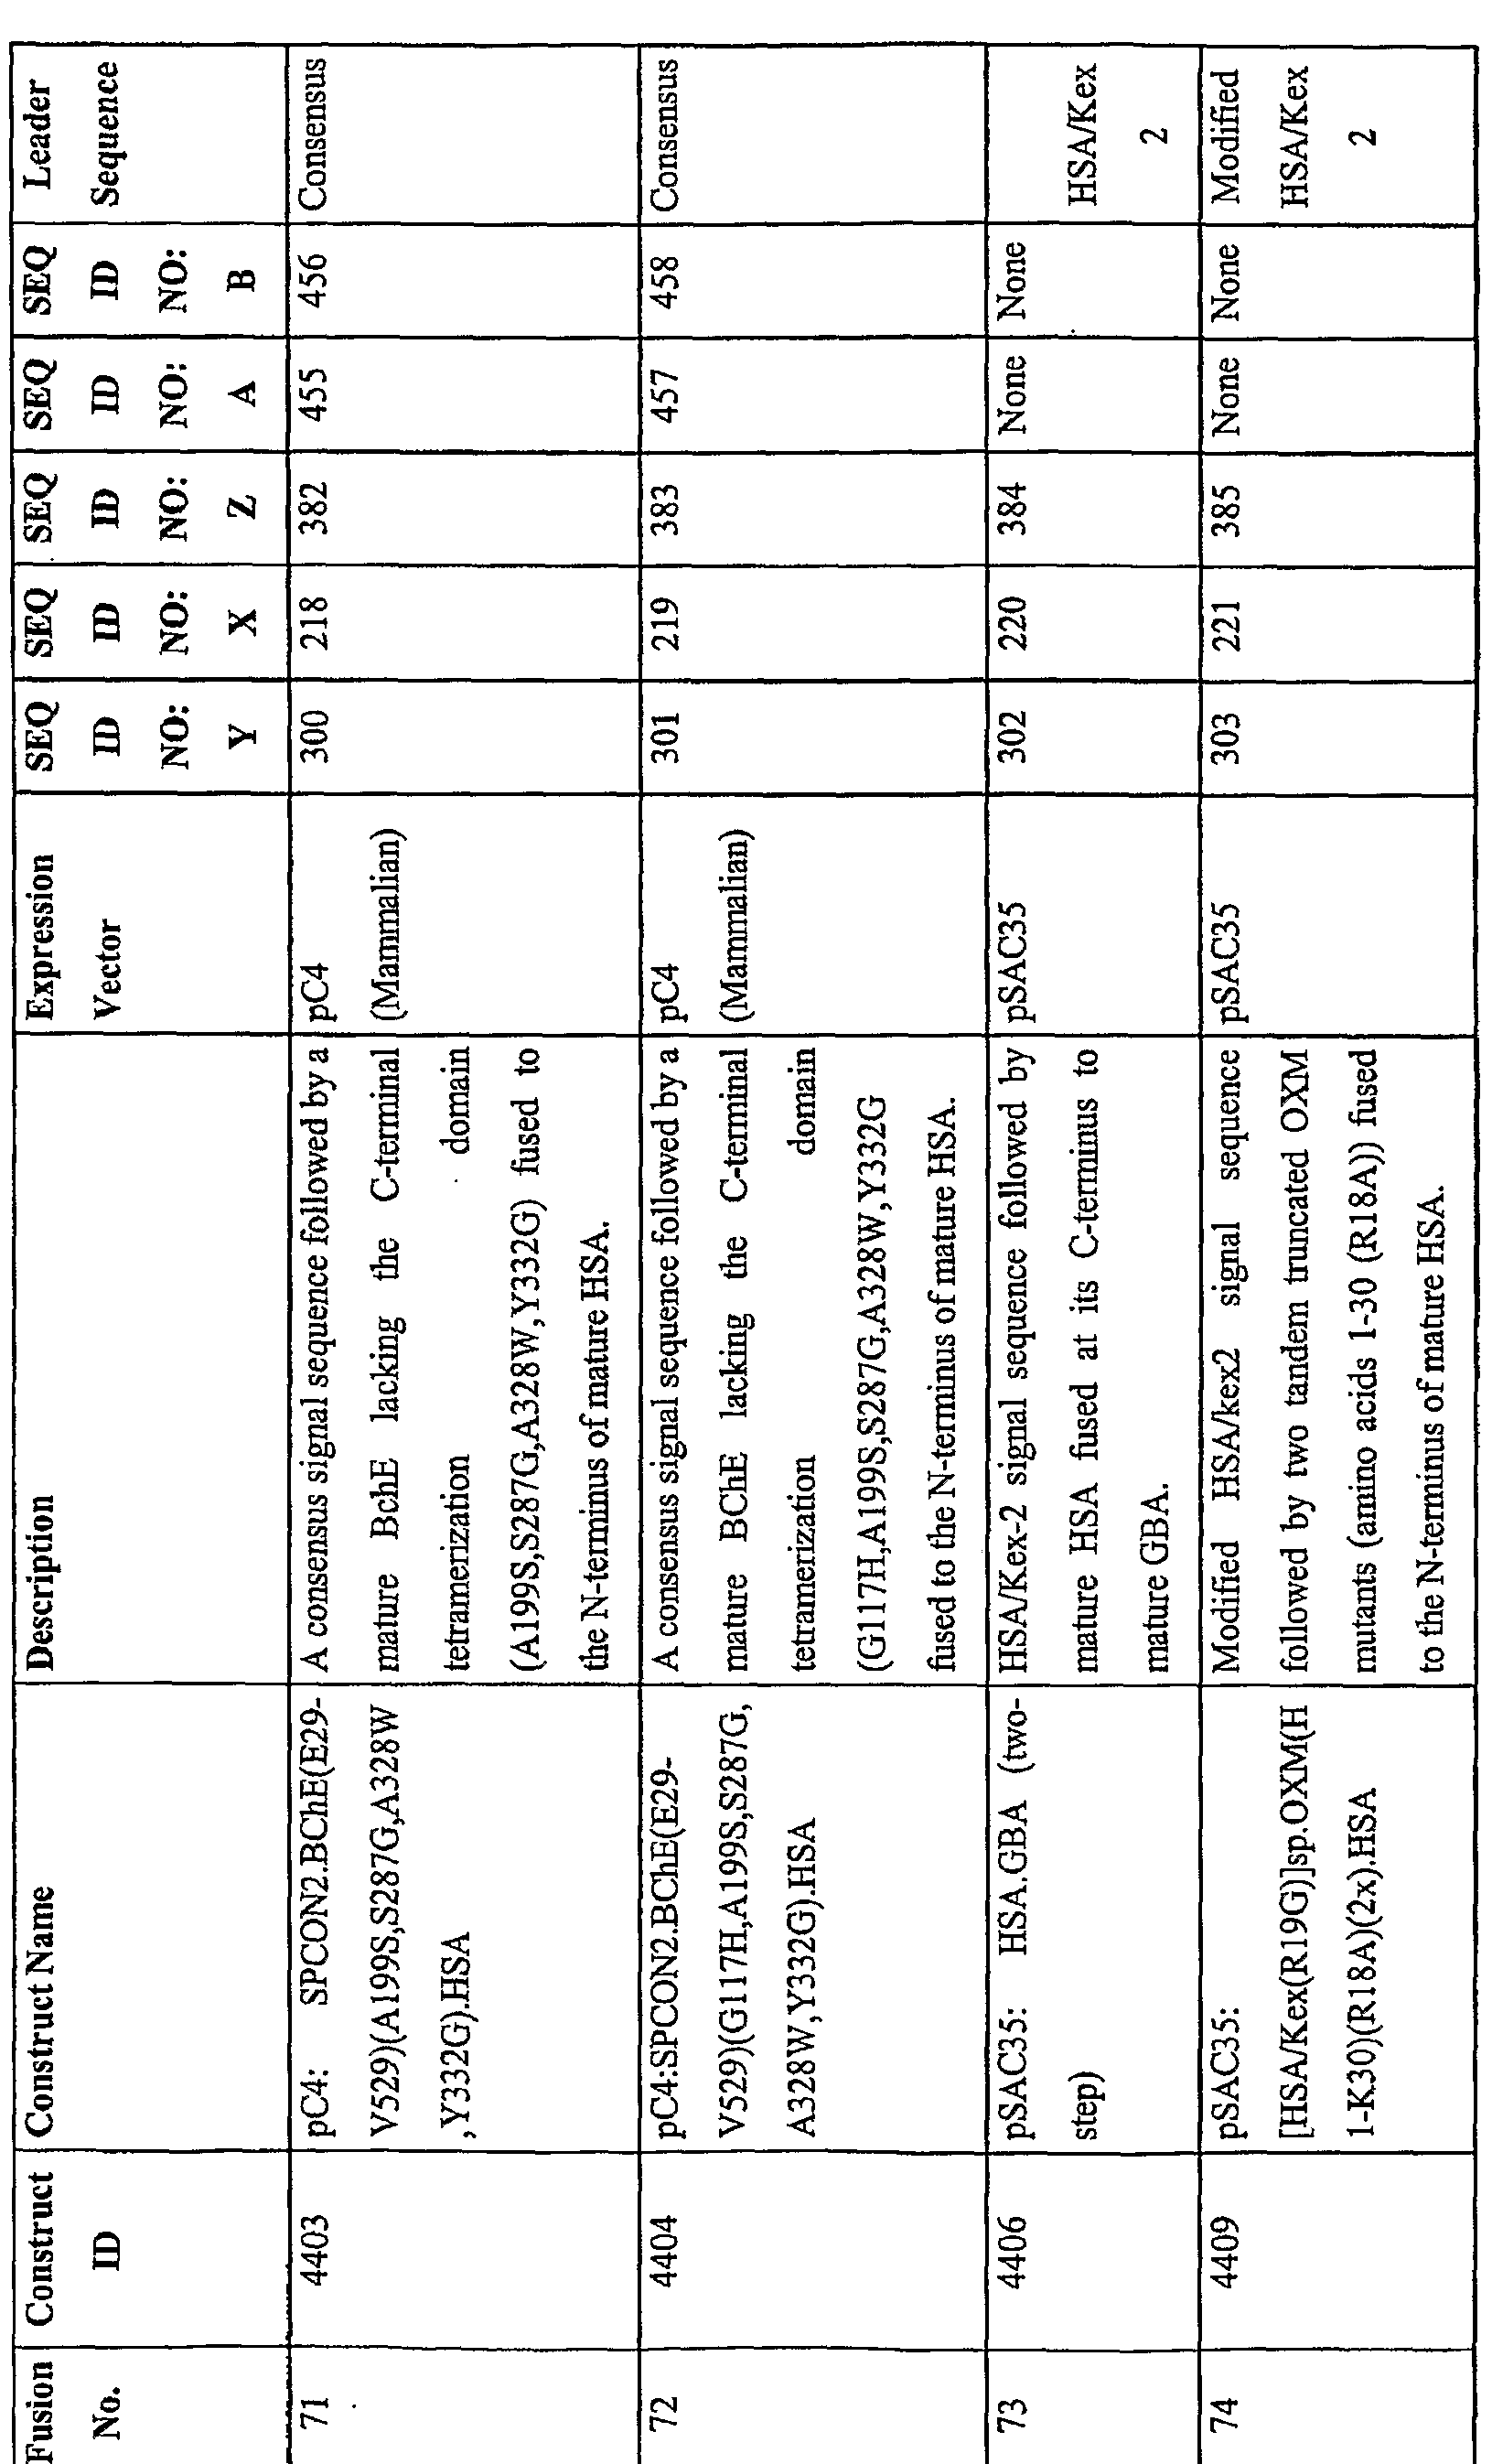 WO A9 Albumin fusion proteins Google Patents